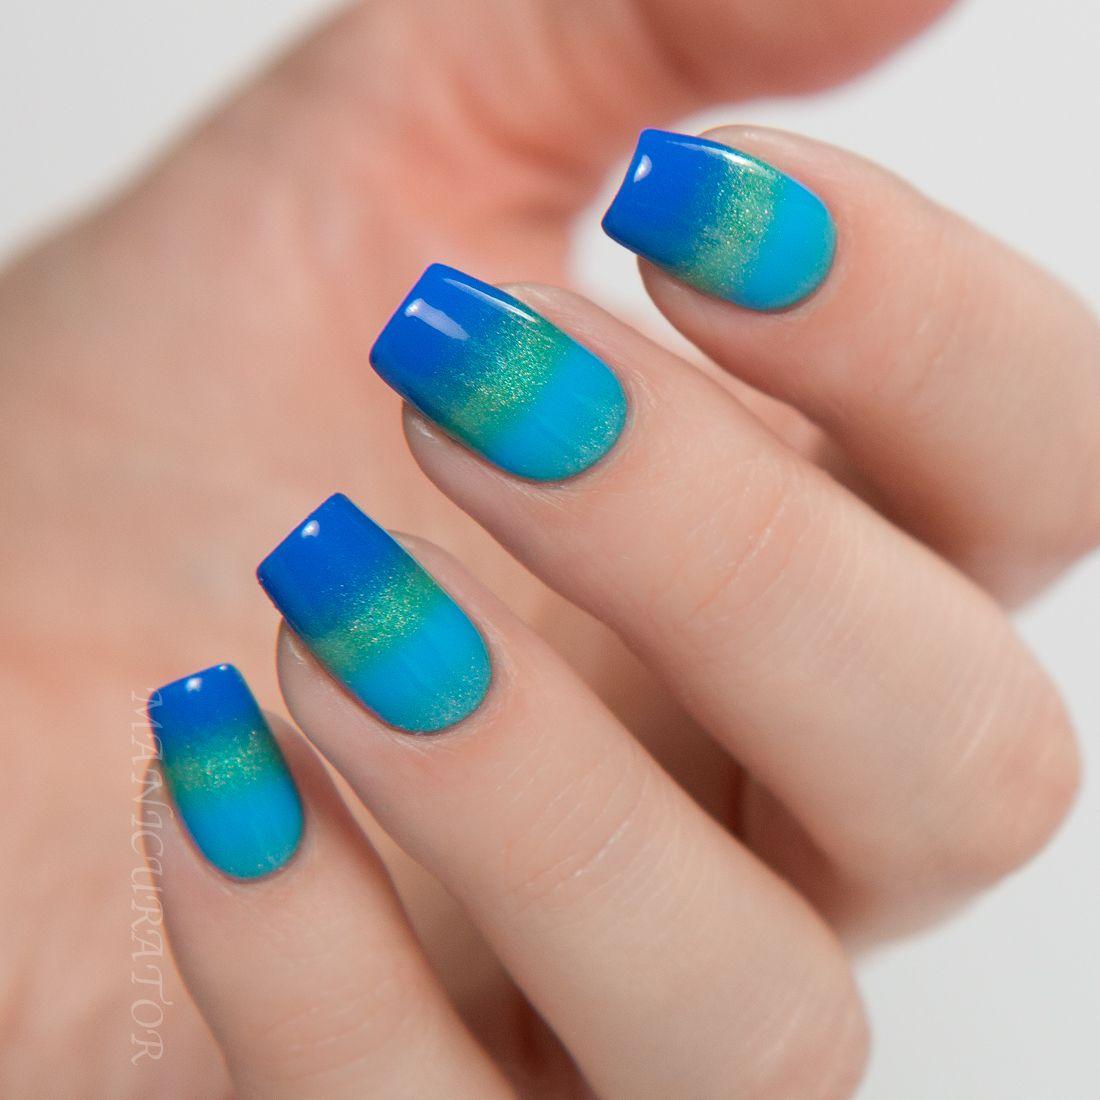 Pollside nail